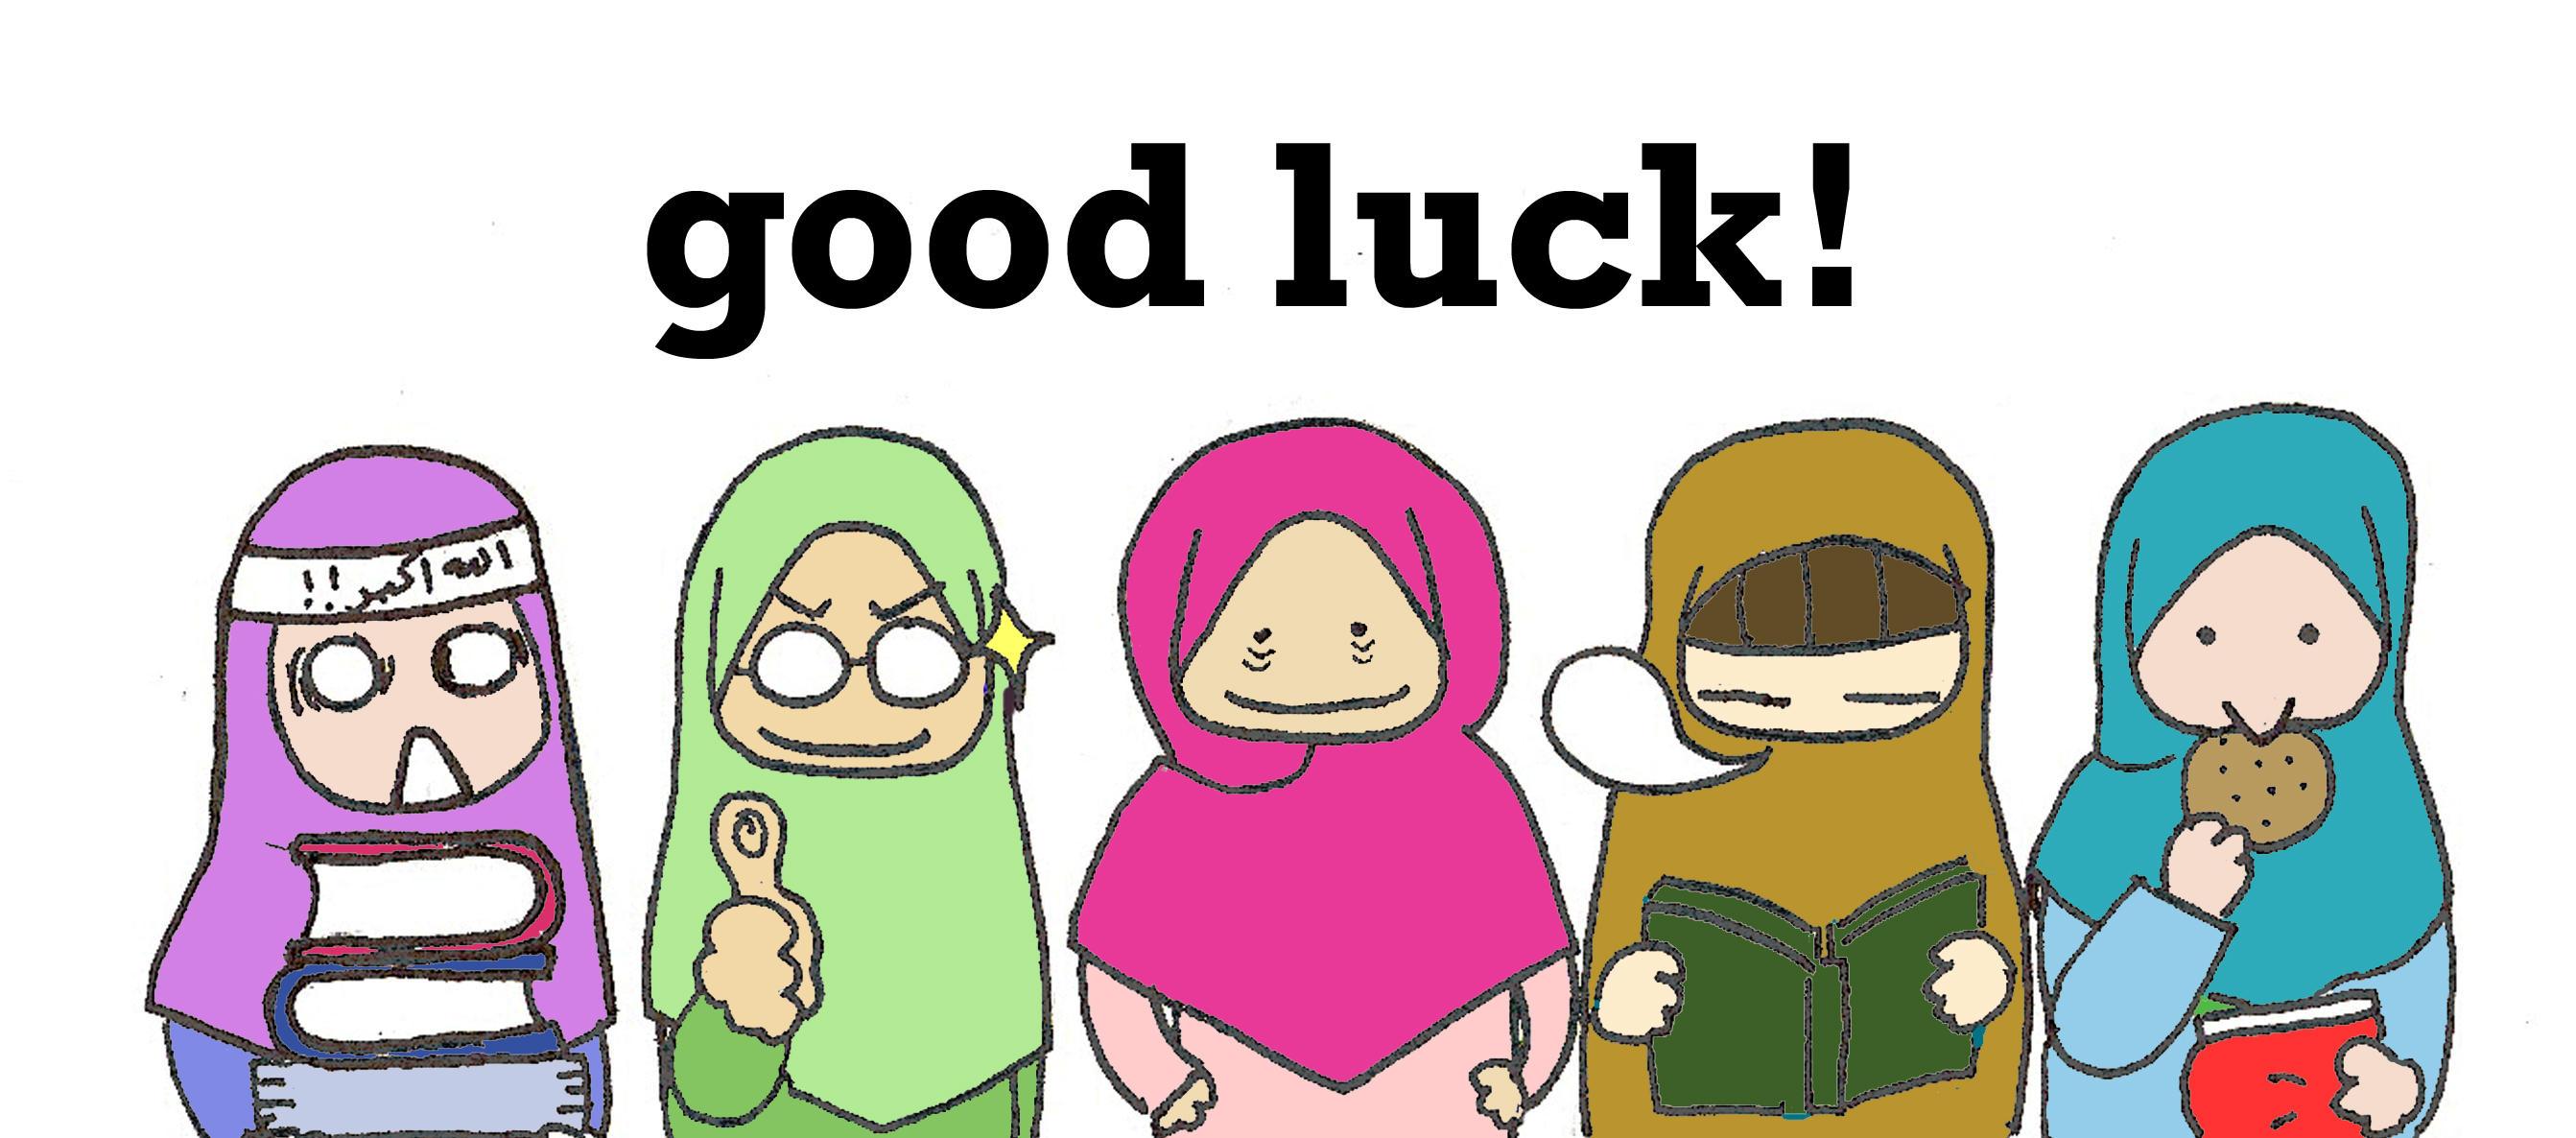 Good Luck on The Exam Exam Mode Good Luck